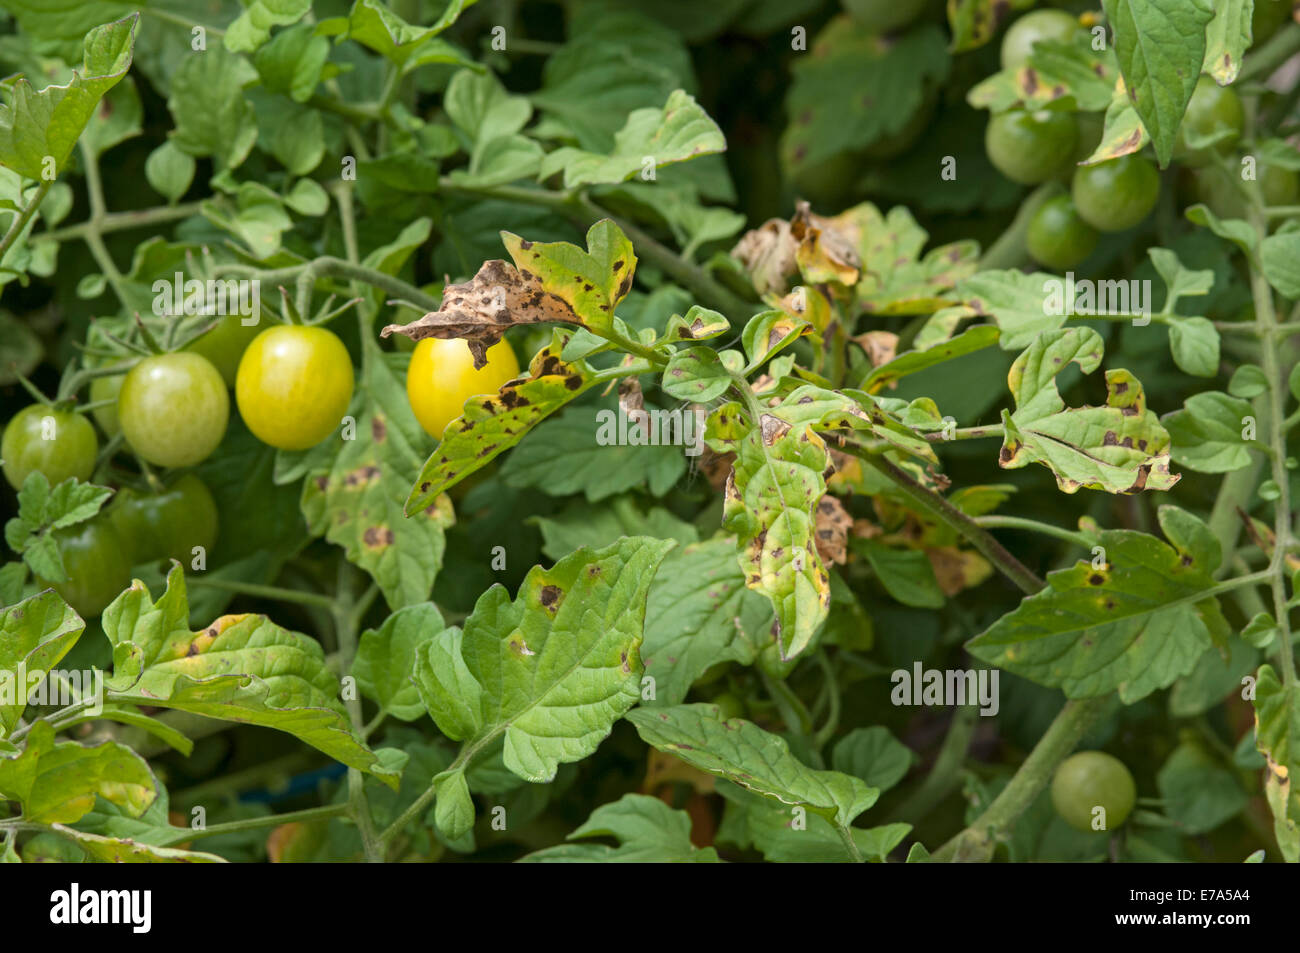 Target spot symptoms on tomato plants - Stock Image